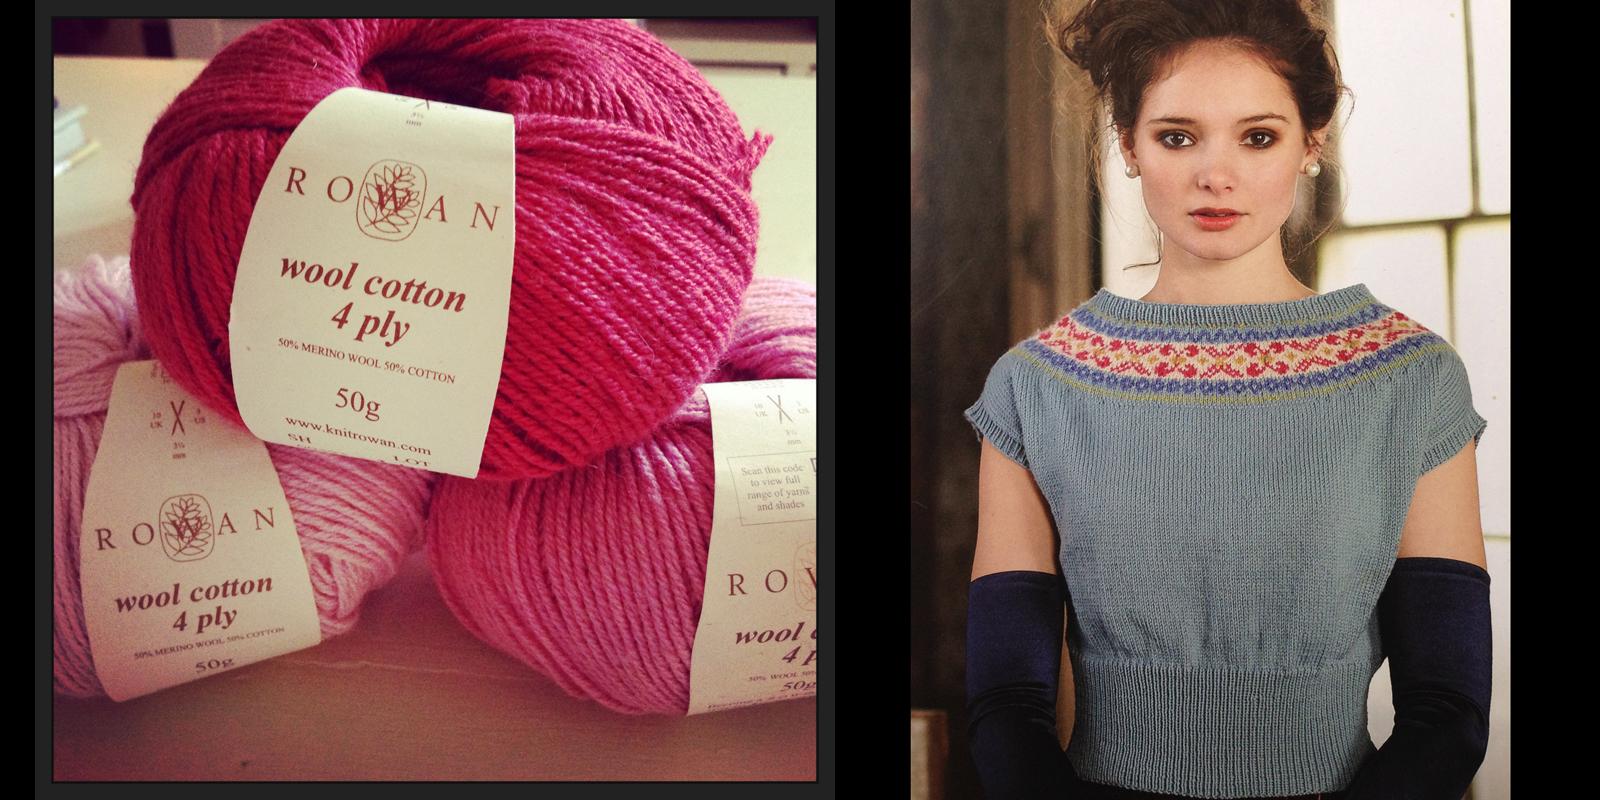 Knitting plans